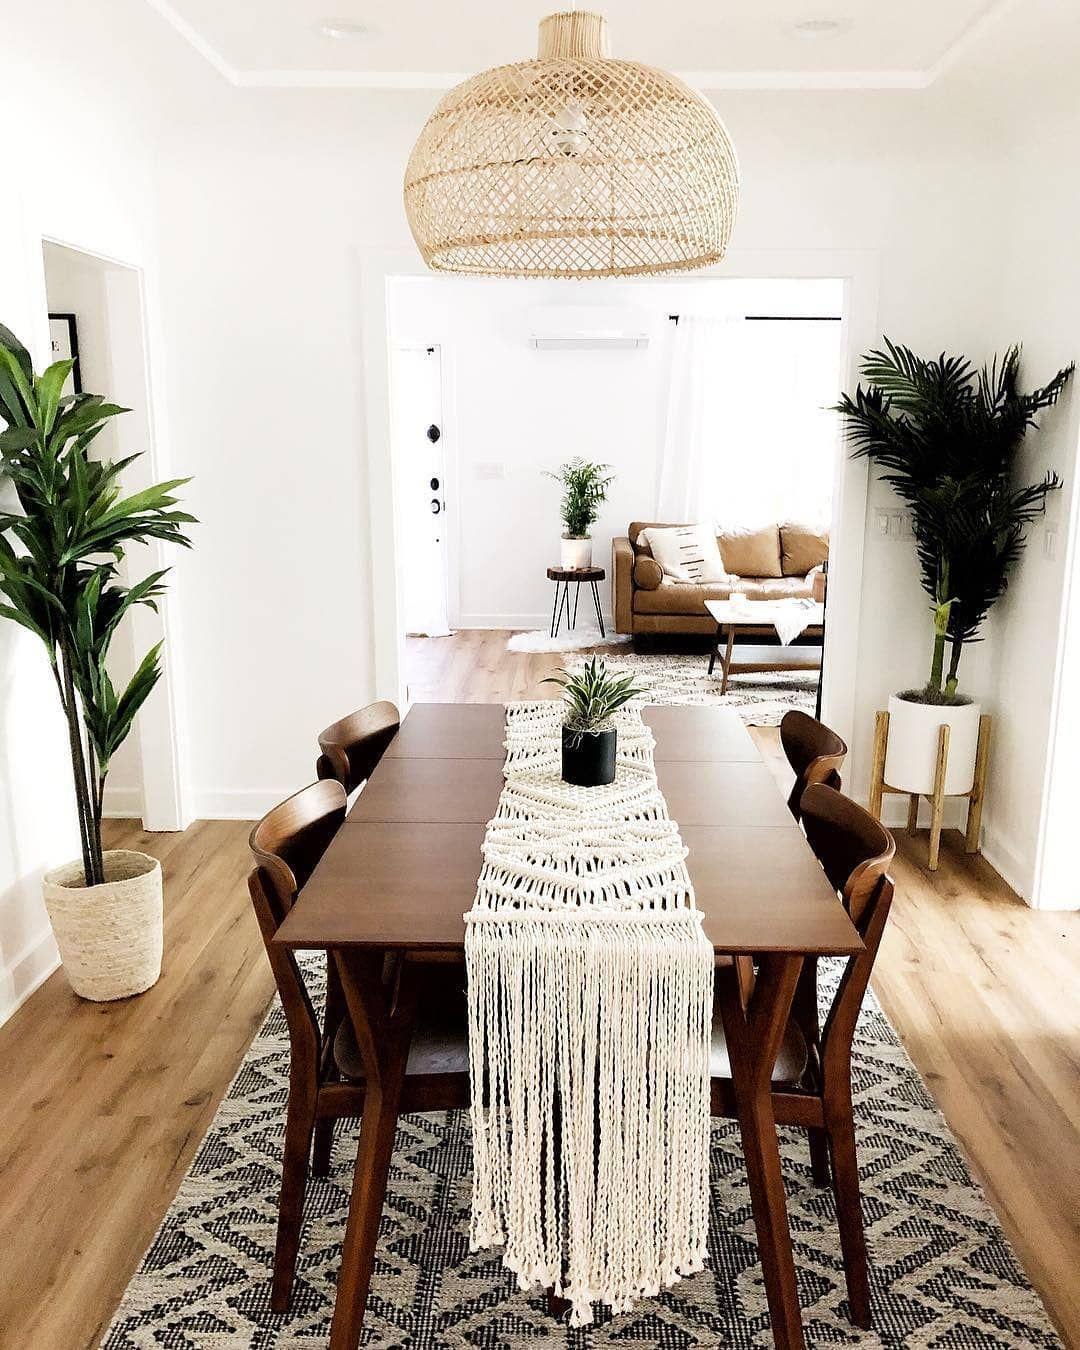 Your Weekend Living Room Inspiration By Cottageandsea Olivrahomedecor Cozyhomes Homedec Living Room Inspiration Dining Room Inspiration Room Inspiration